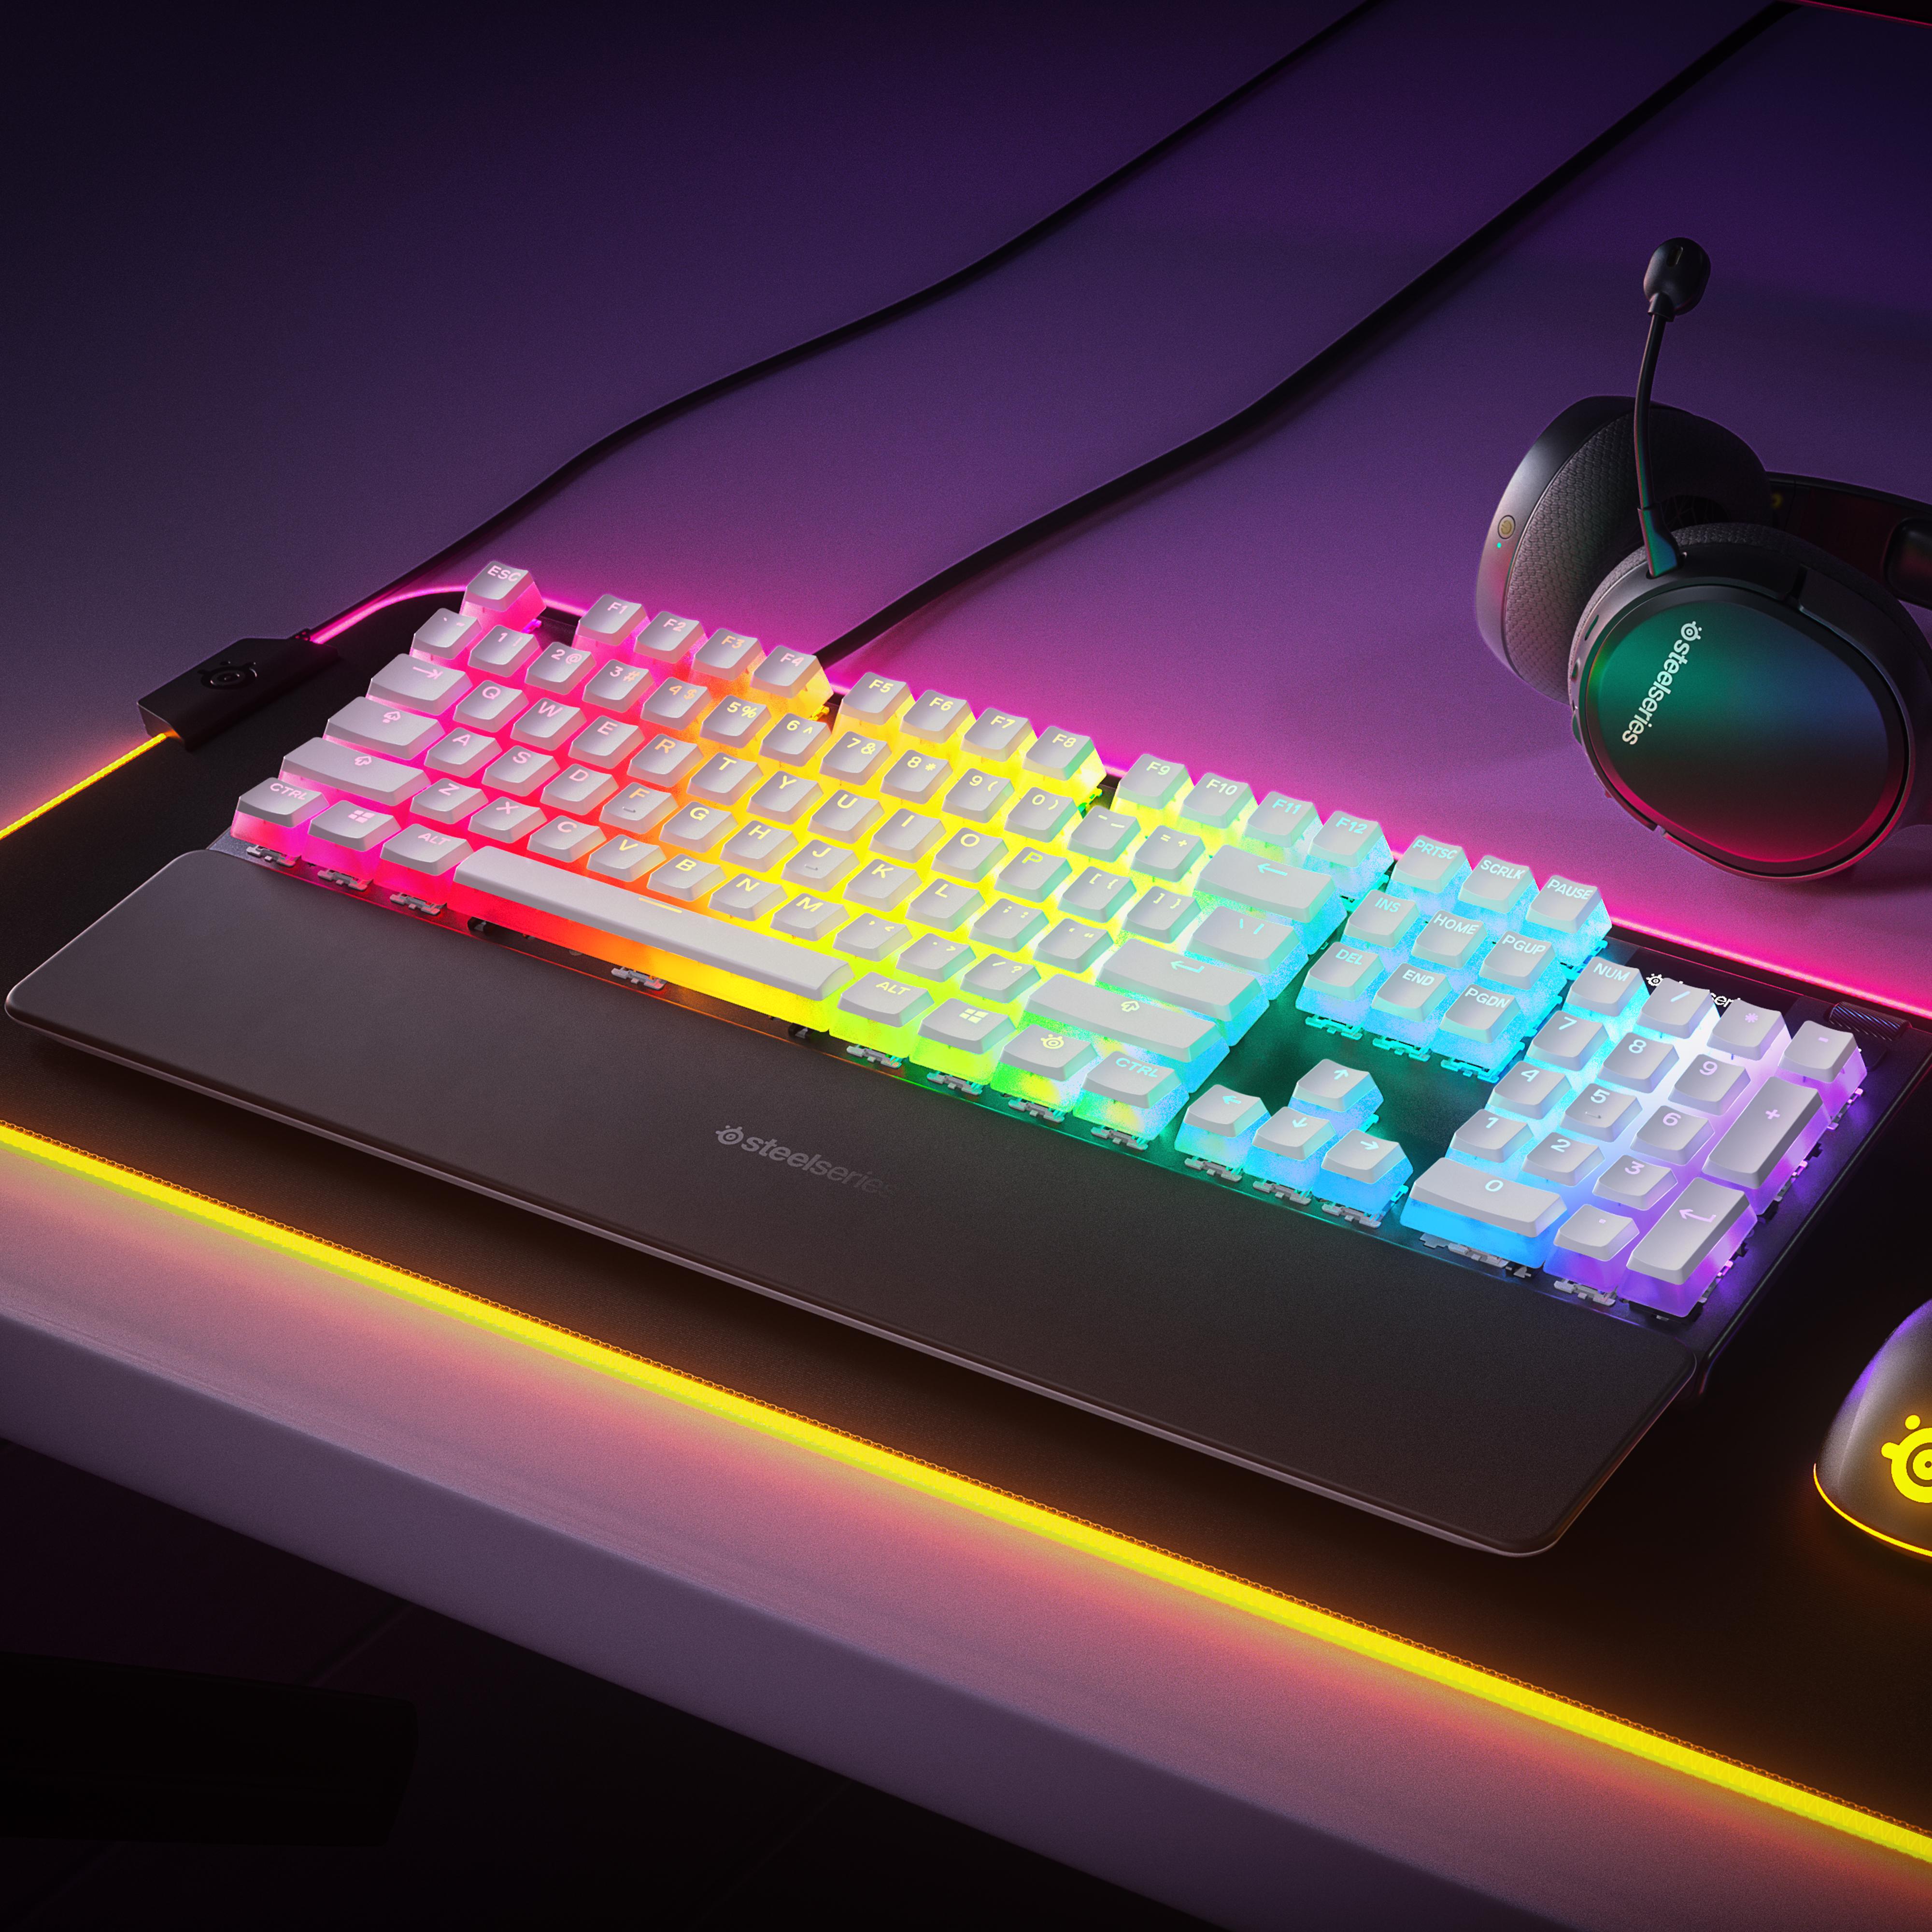 PrismCaps on a SteelSeries keyboard